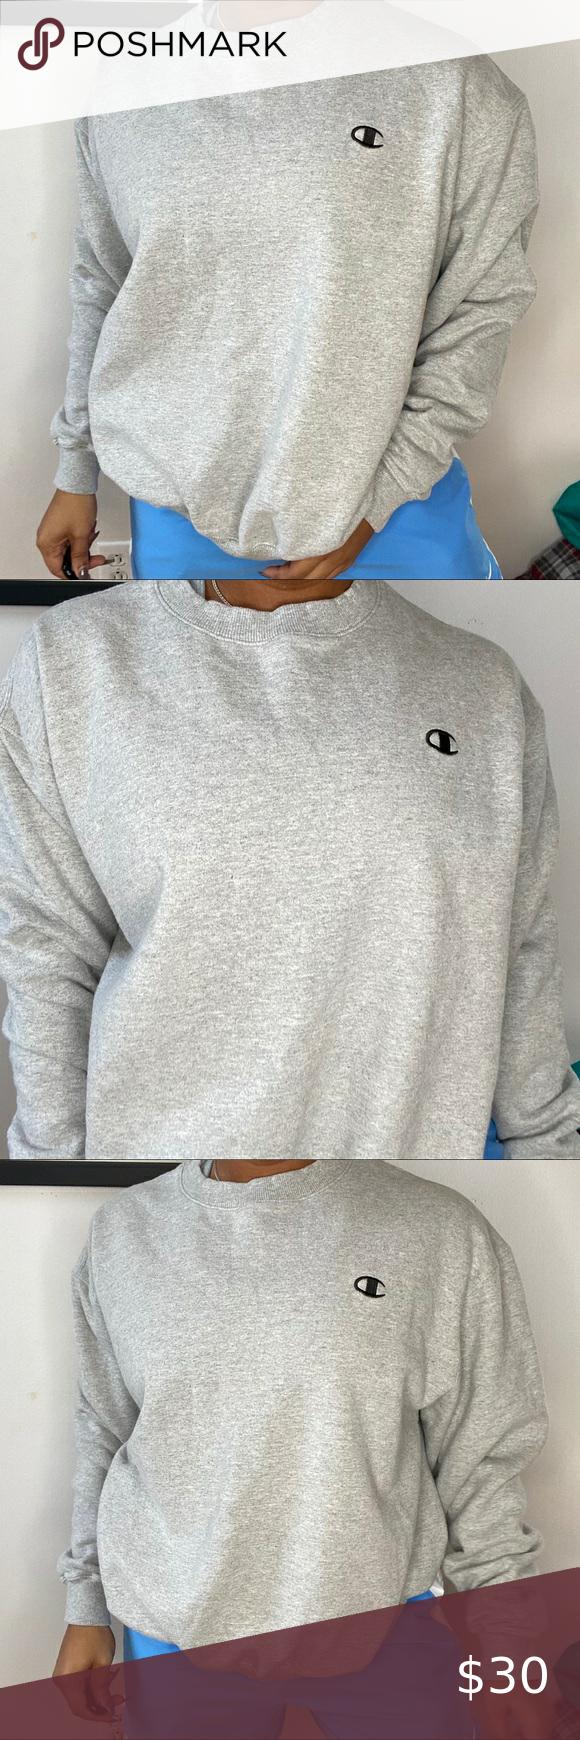 Champion Authentic Sweatshirt Sweatshirts Sweatshirt Tops Sweatshirts Hoodie [ 1740 x 580 Pixel ]